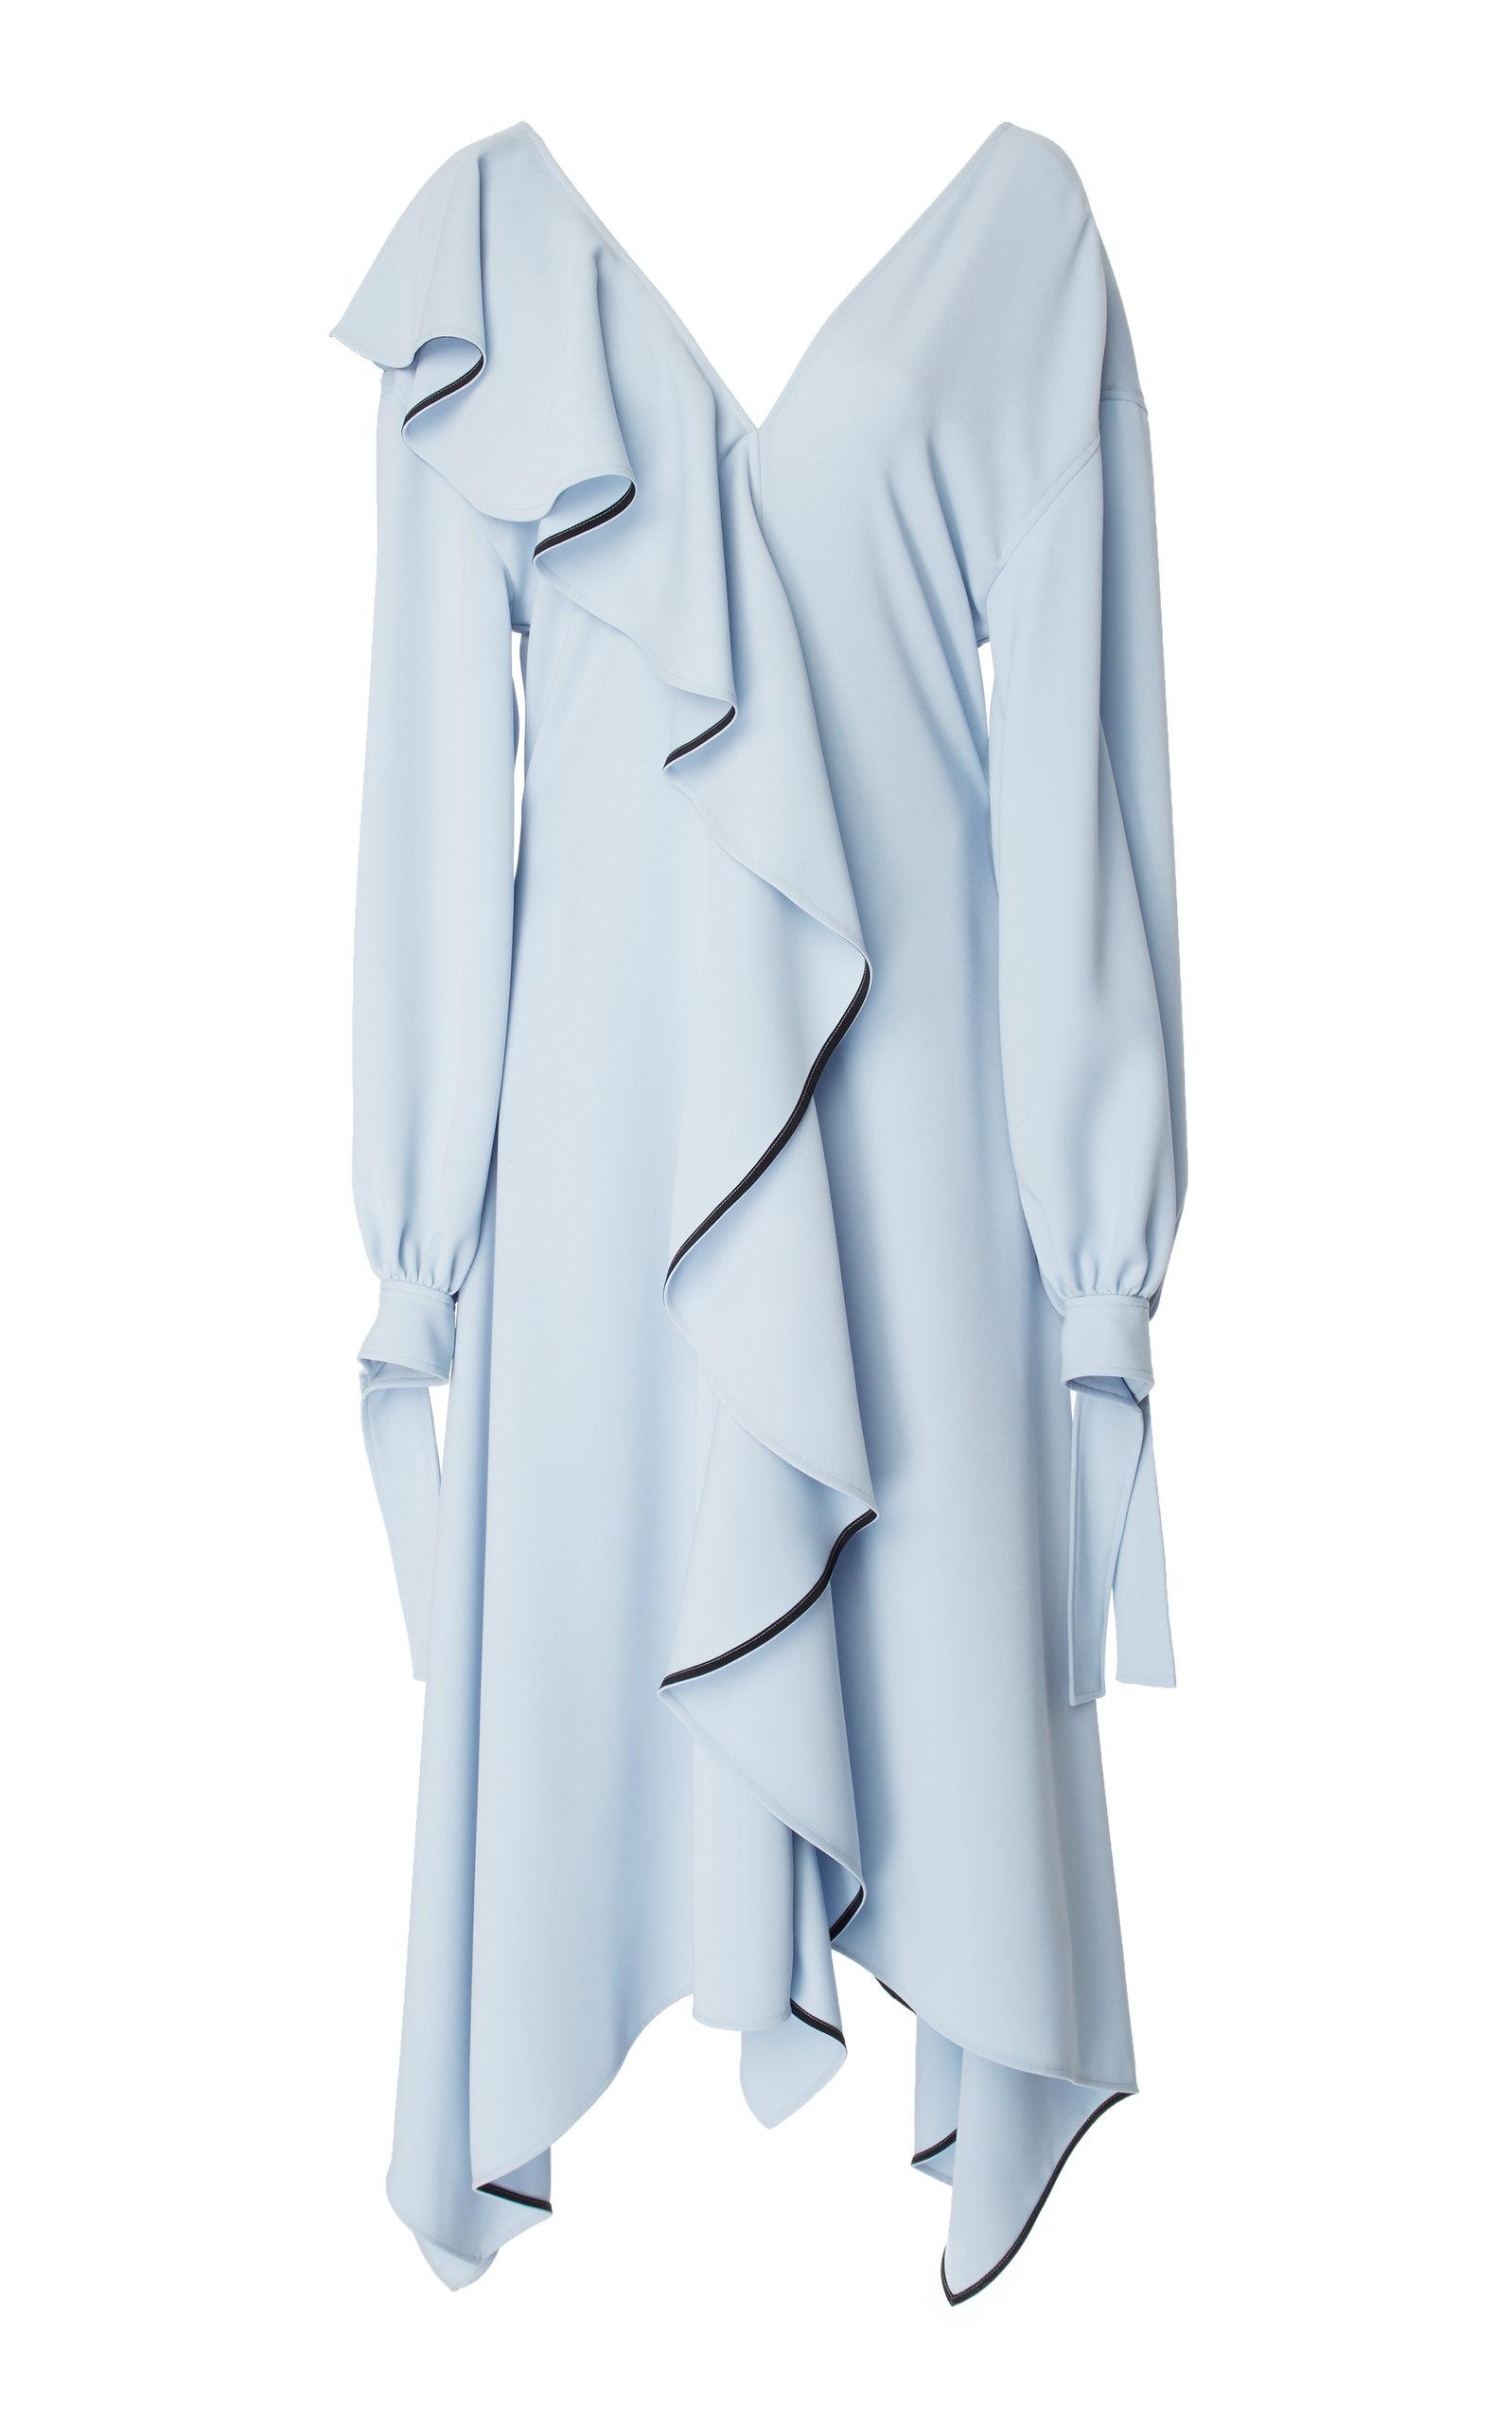 ADEAM Ruffle Dress in Blue